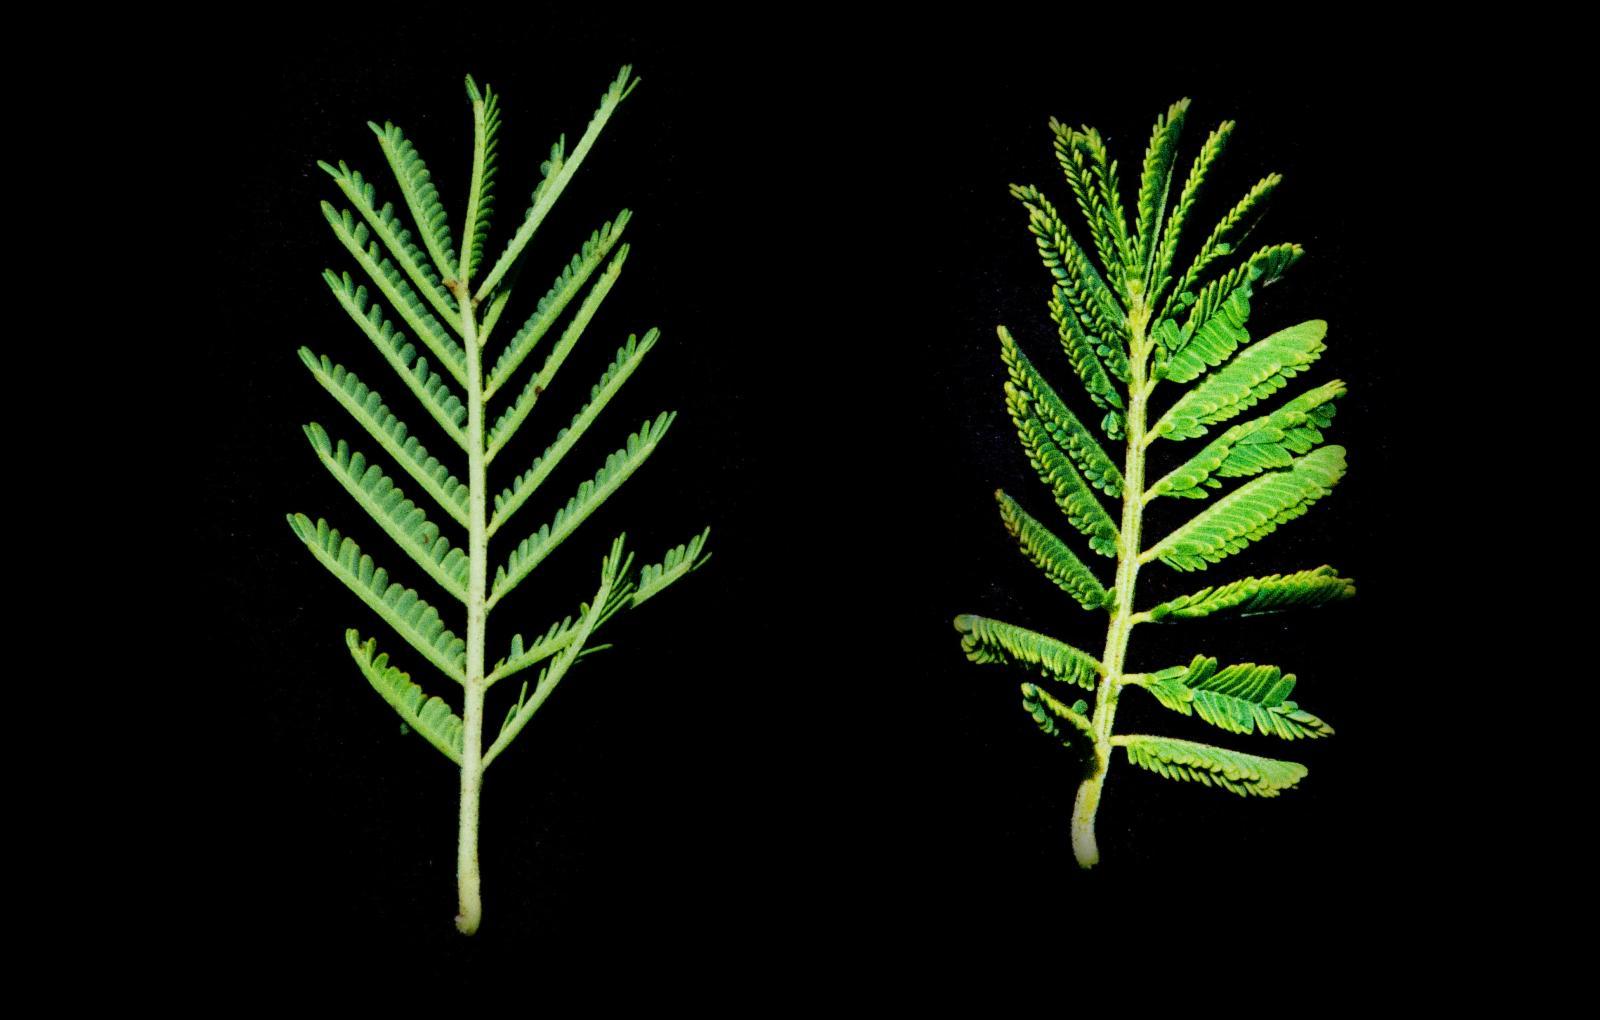 Vachellia Karroo Hayne Banfi Galasso Plants Of The World